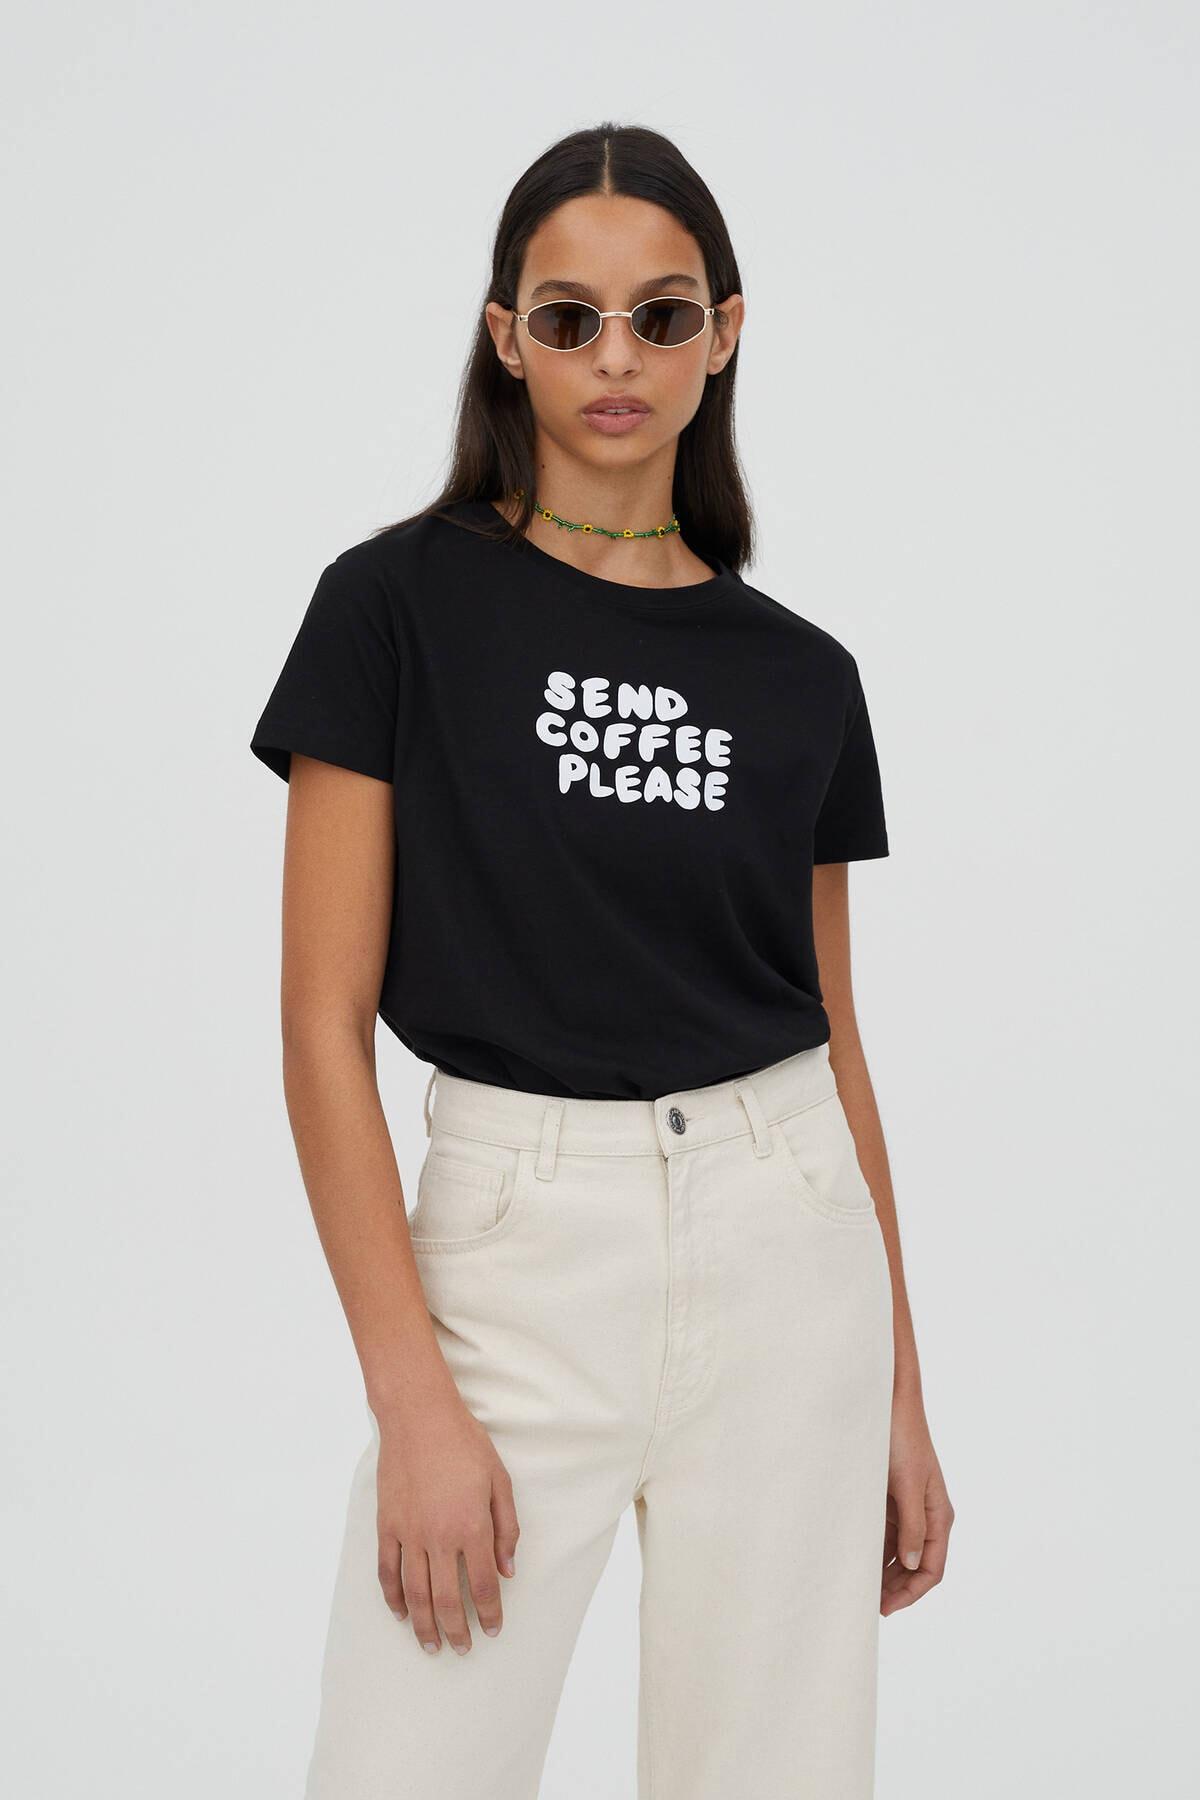 Pull & Bear Kadın Kontrast Sloganlı Siyah T-Shirt - %100 Organik Pamuklu 04240310 0